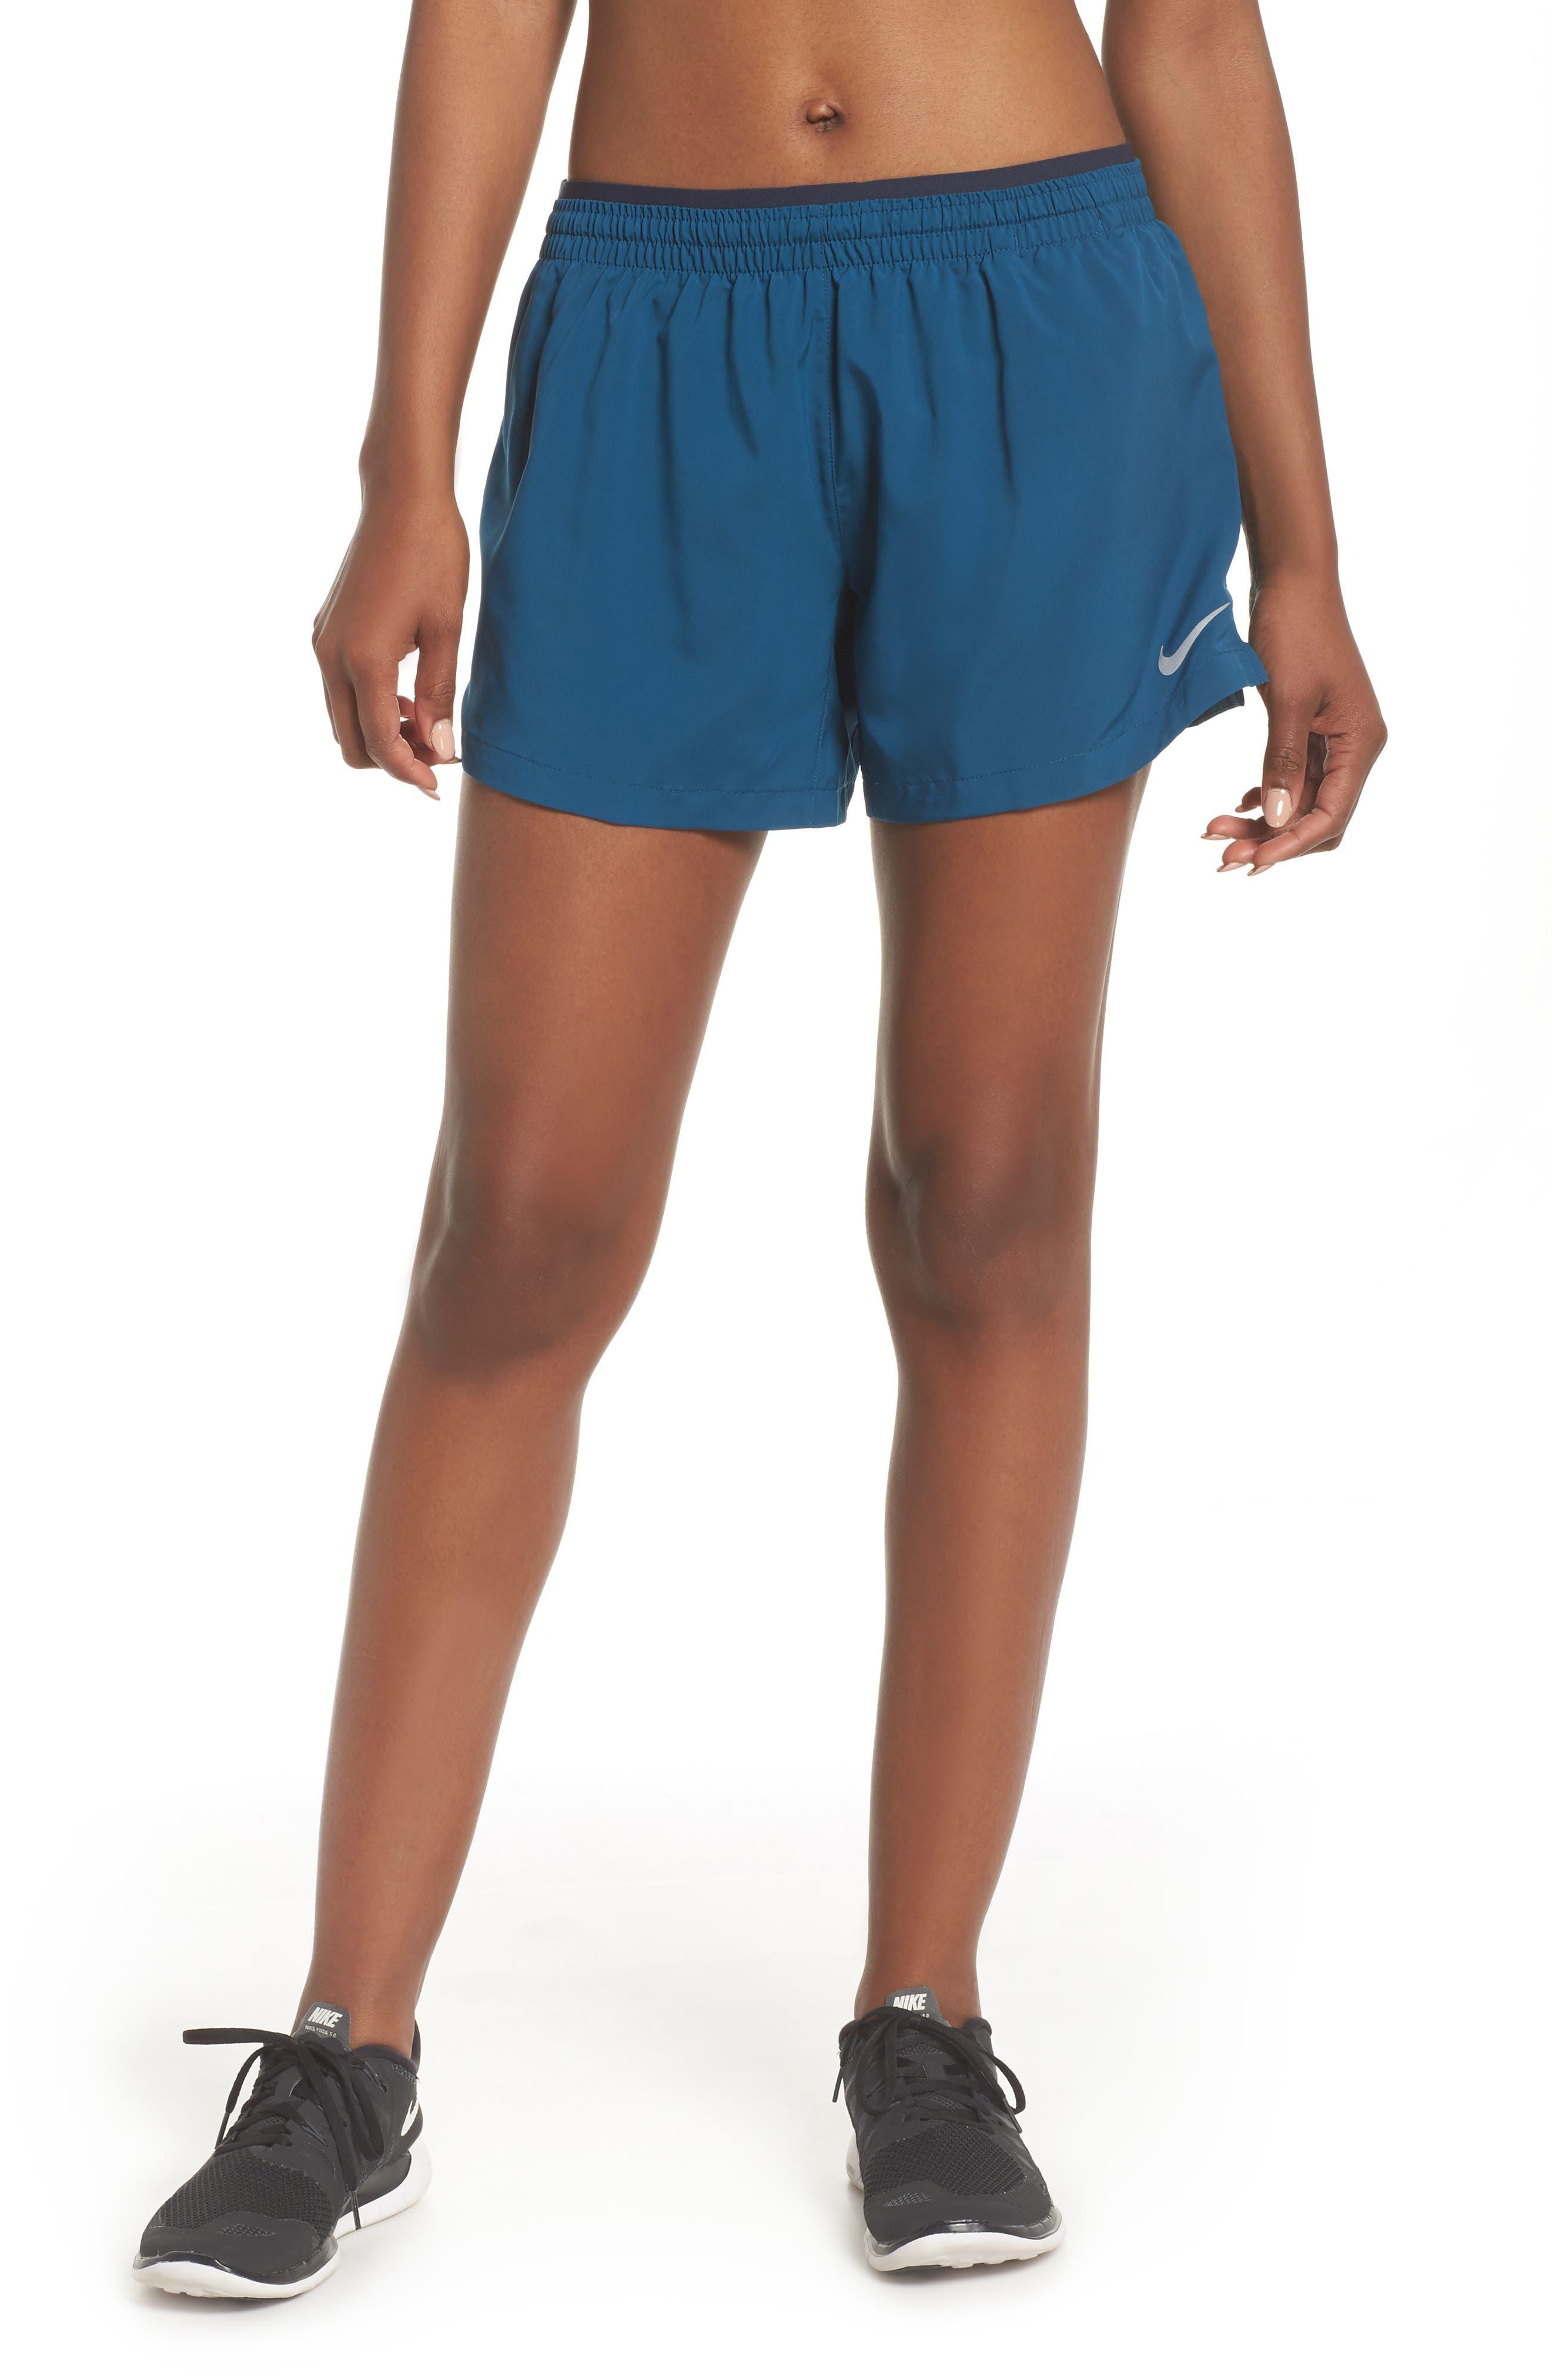 Flex Running Shorts,                         Main,                         color, Blue Force/ Obsidian